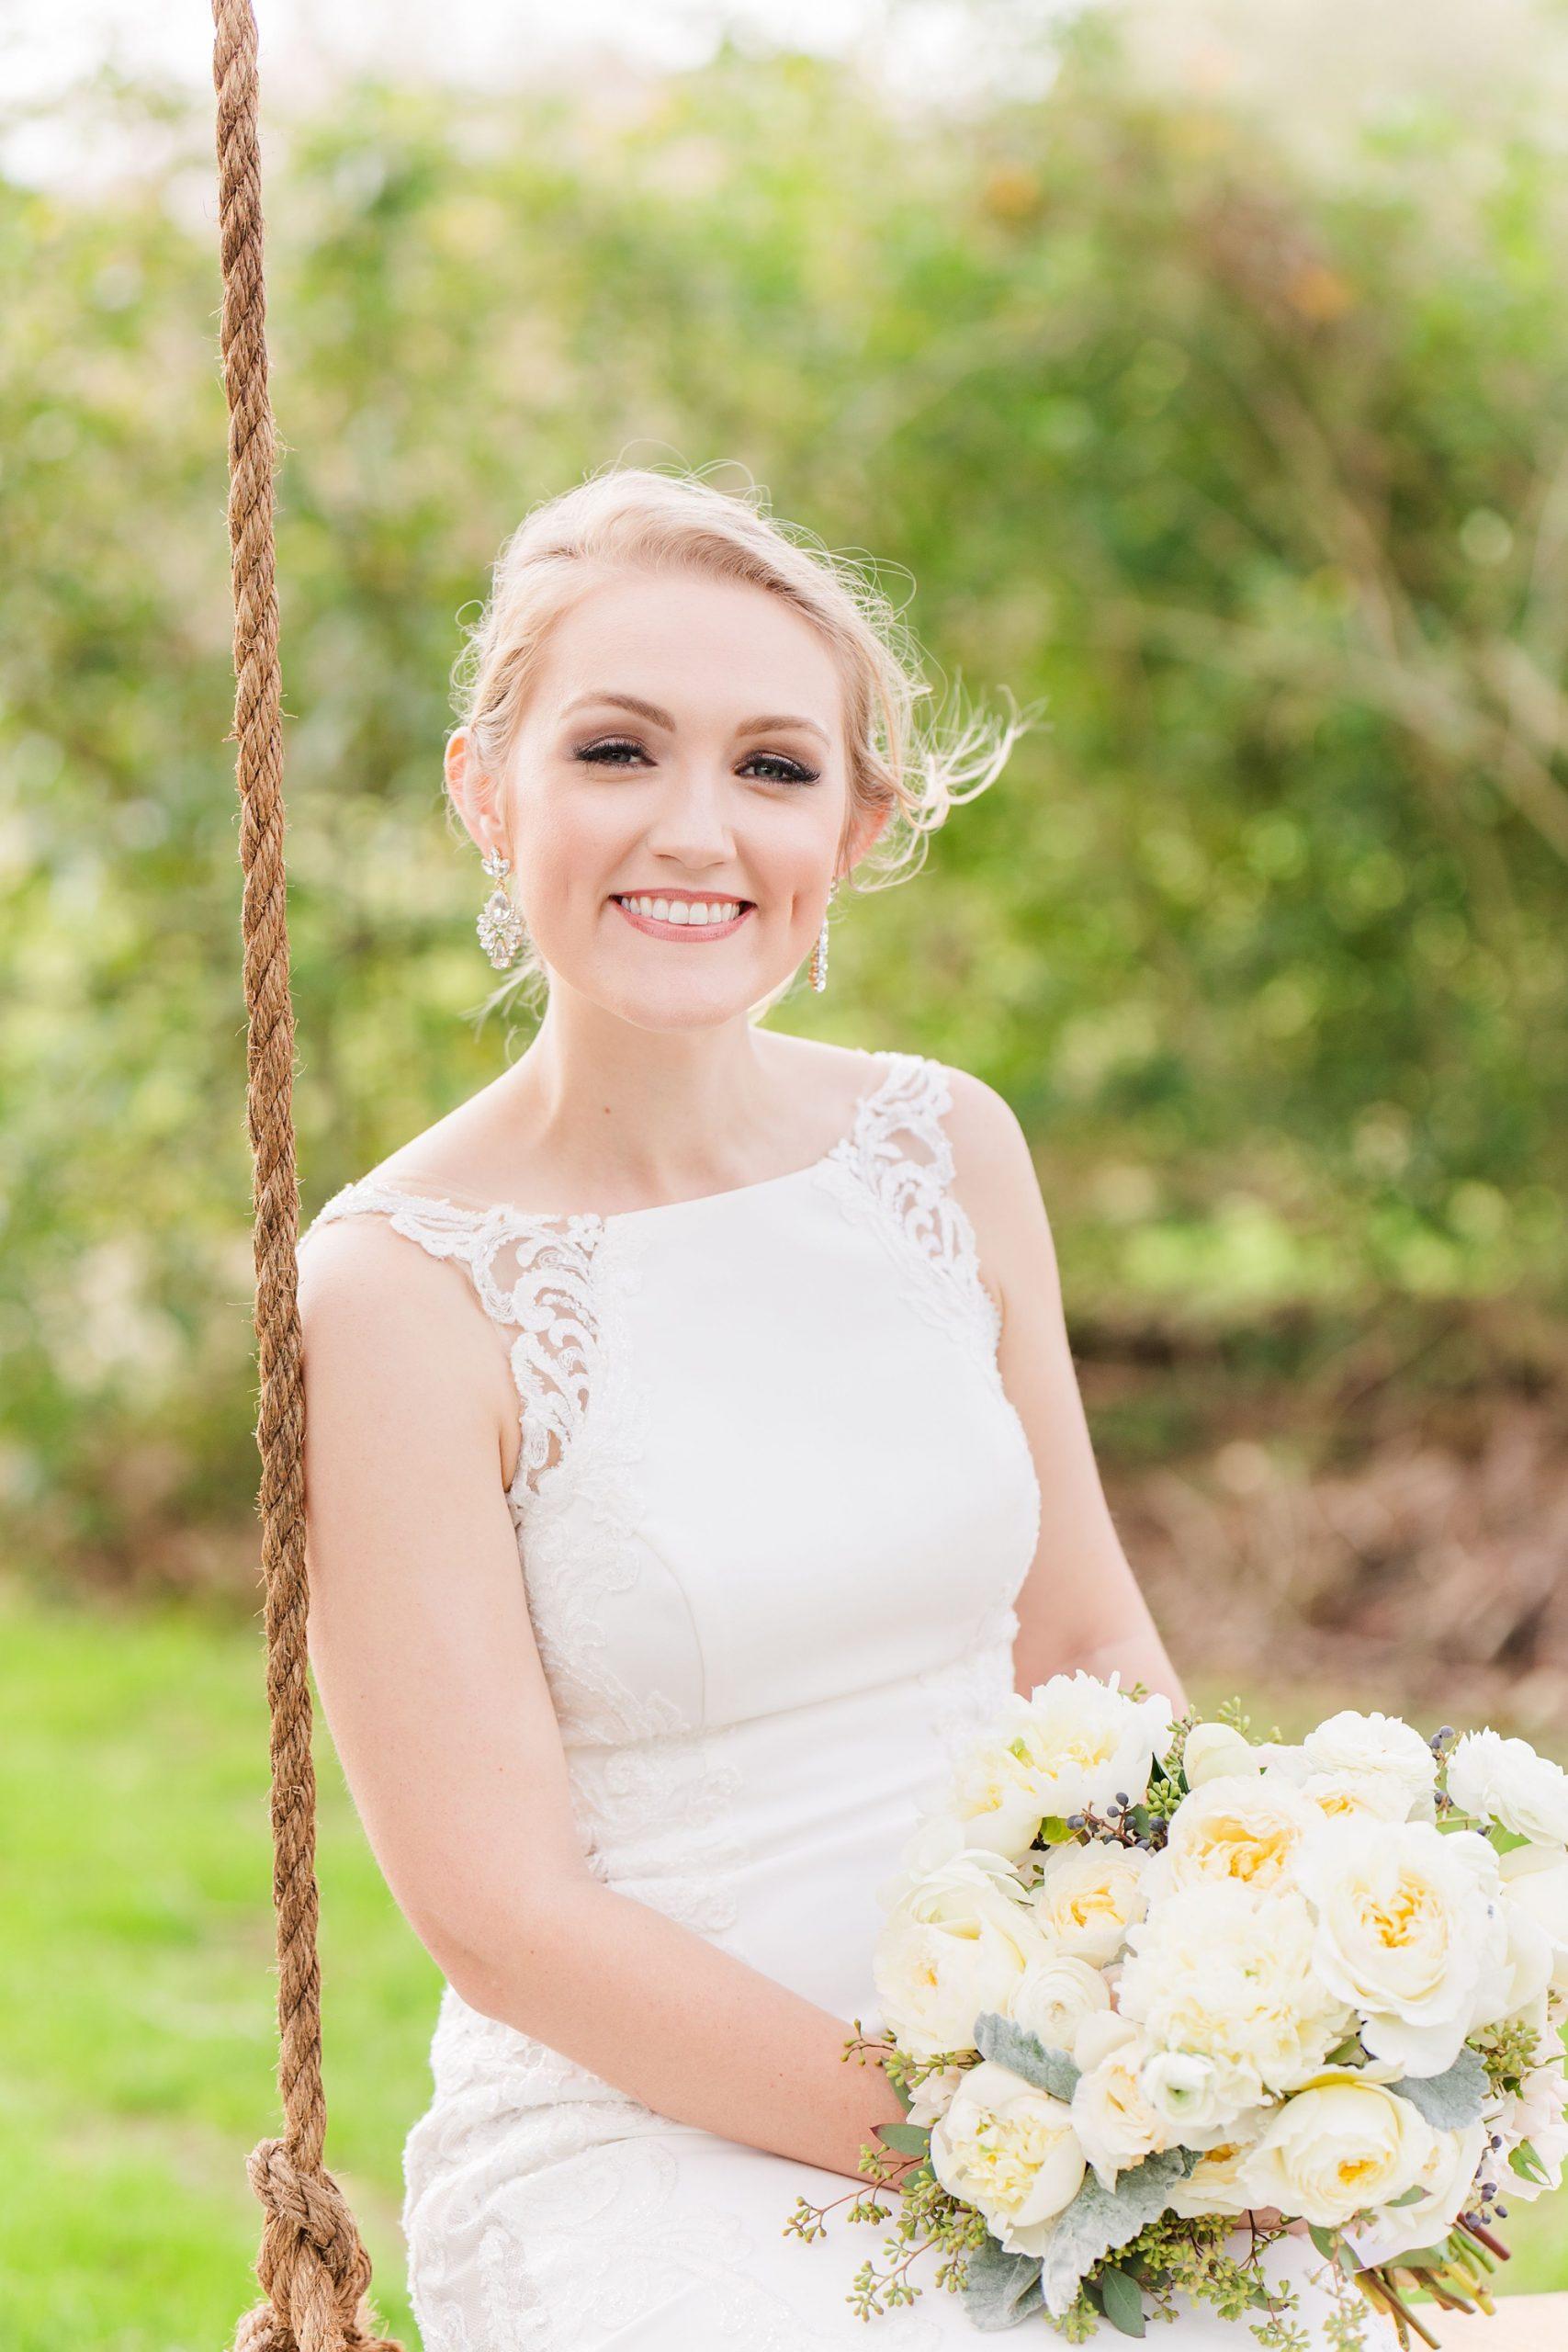 bride leans on rope during wedding portraits in Fairhope AL